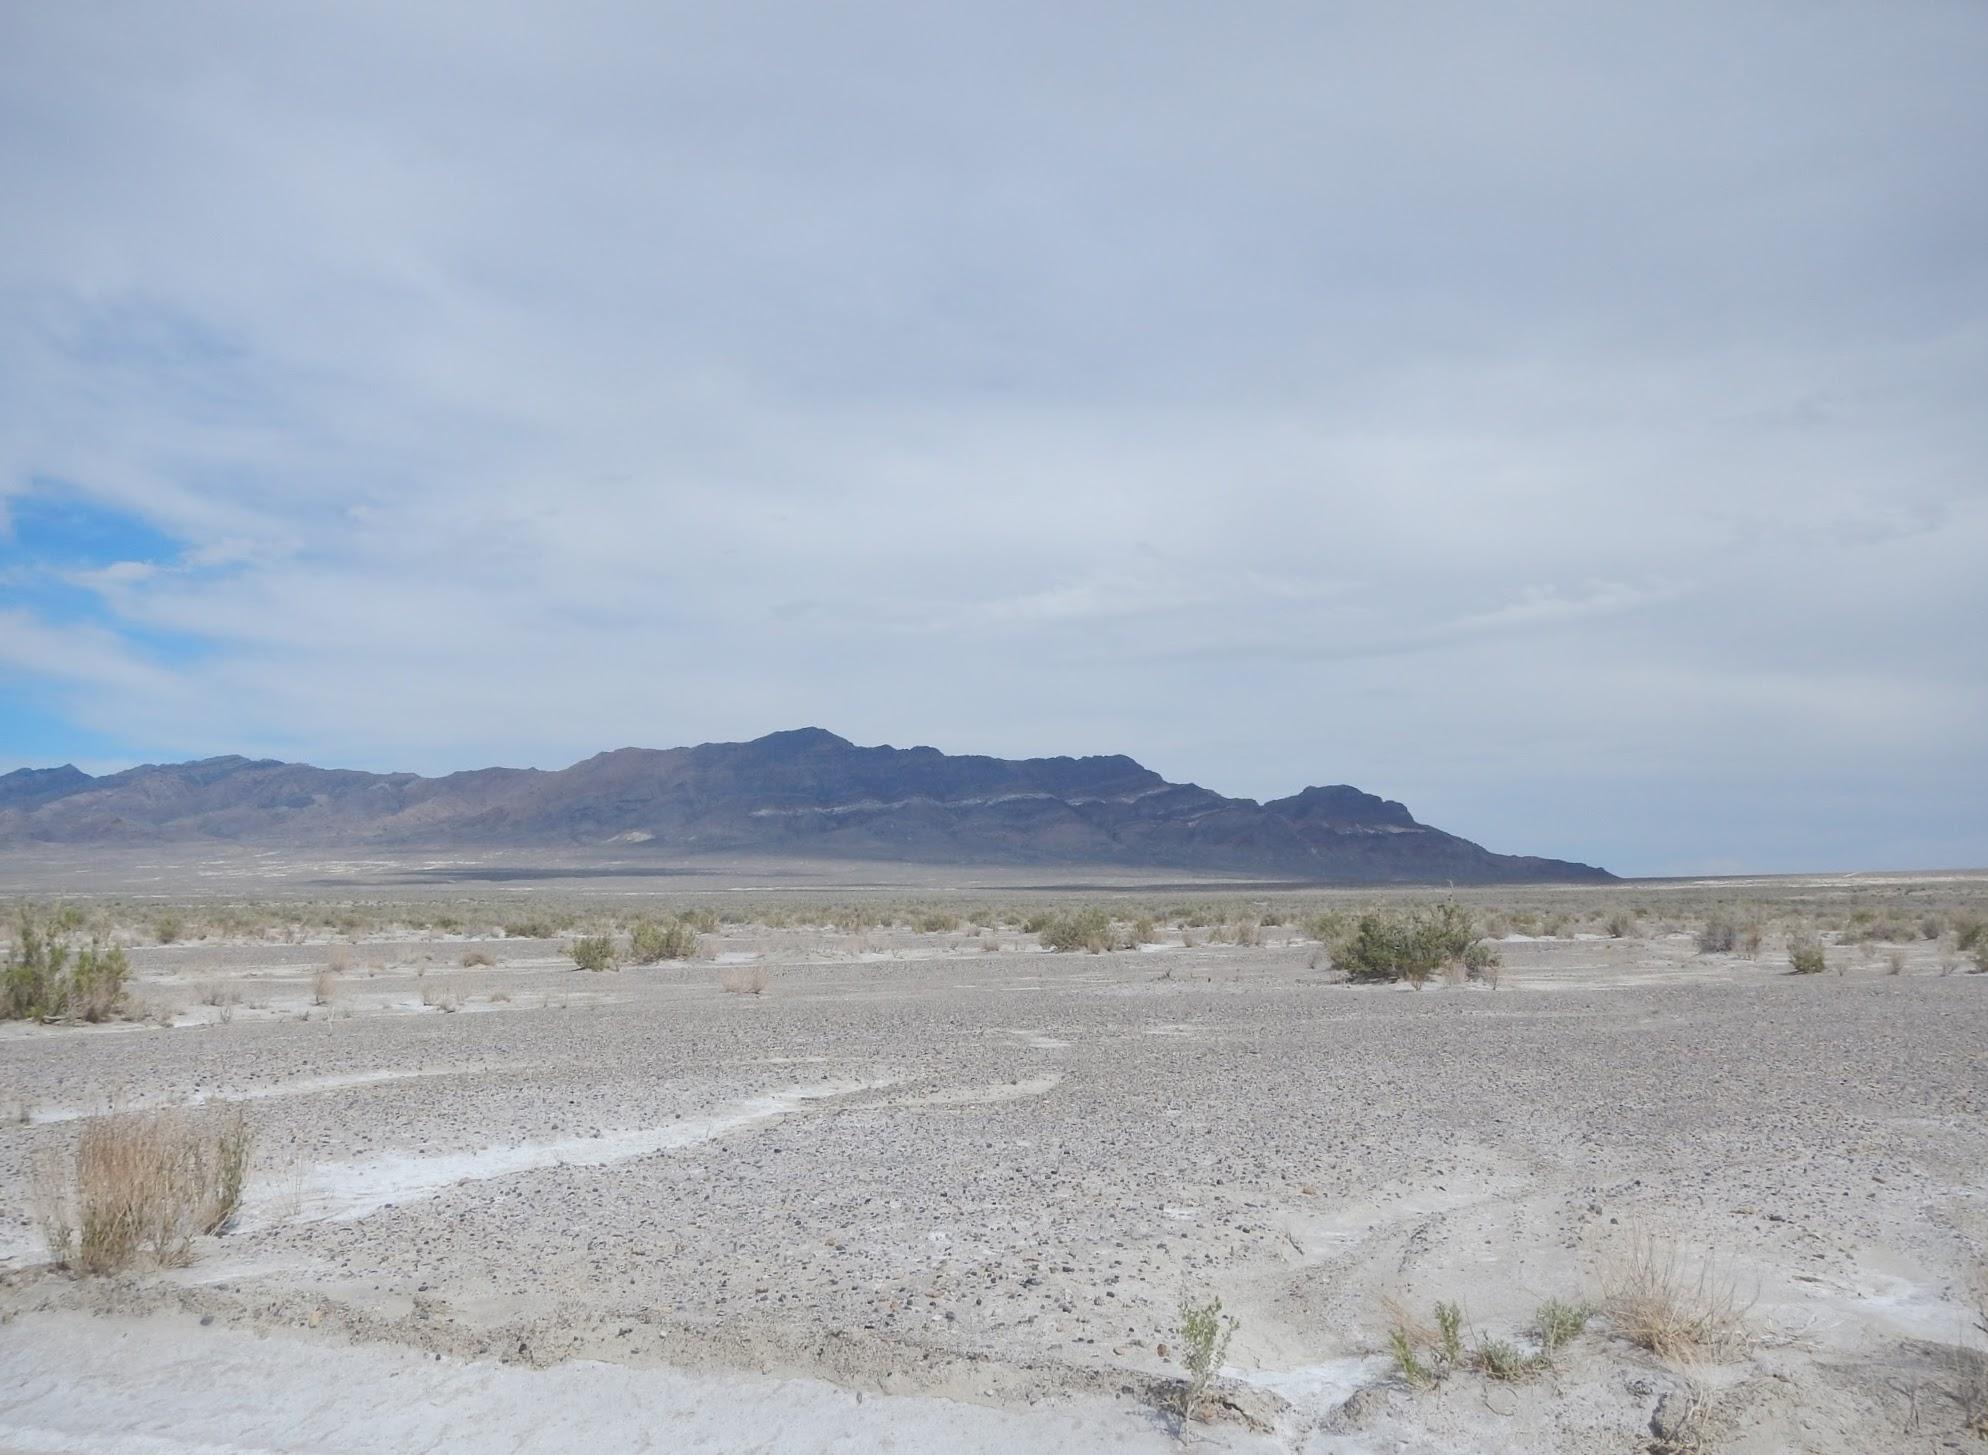 Photo: Desolate landscape